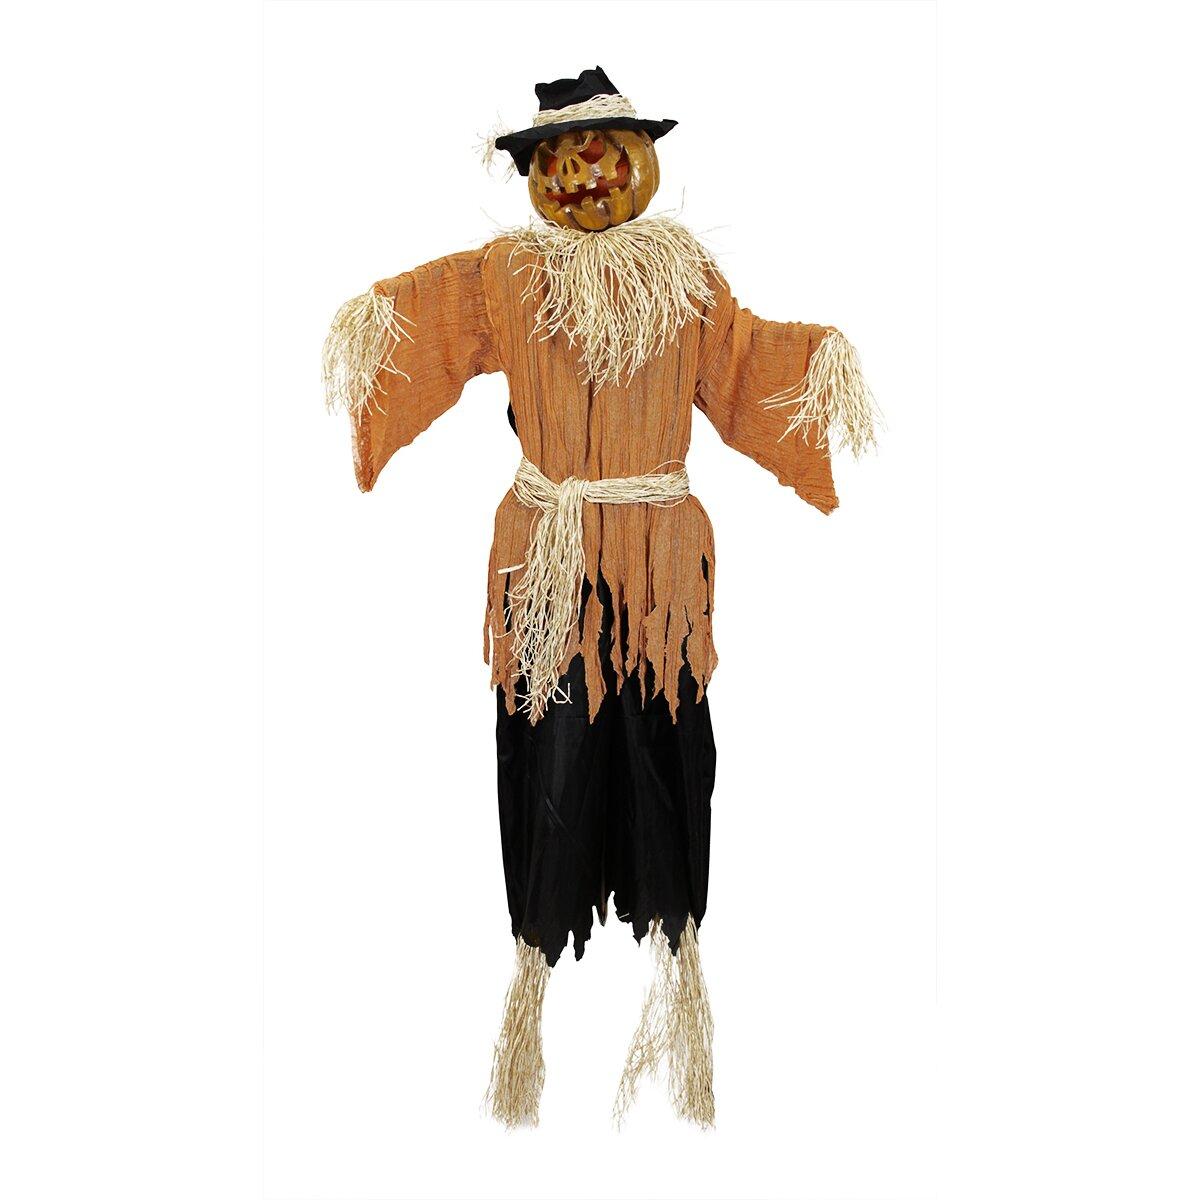 Creepy Jack-o'-Lantern Scarecrow Halloween Decoration | Wayfair